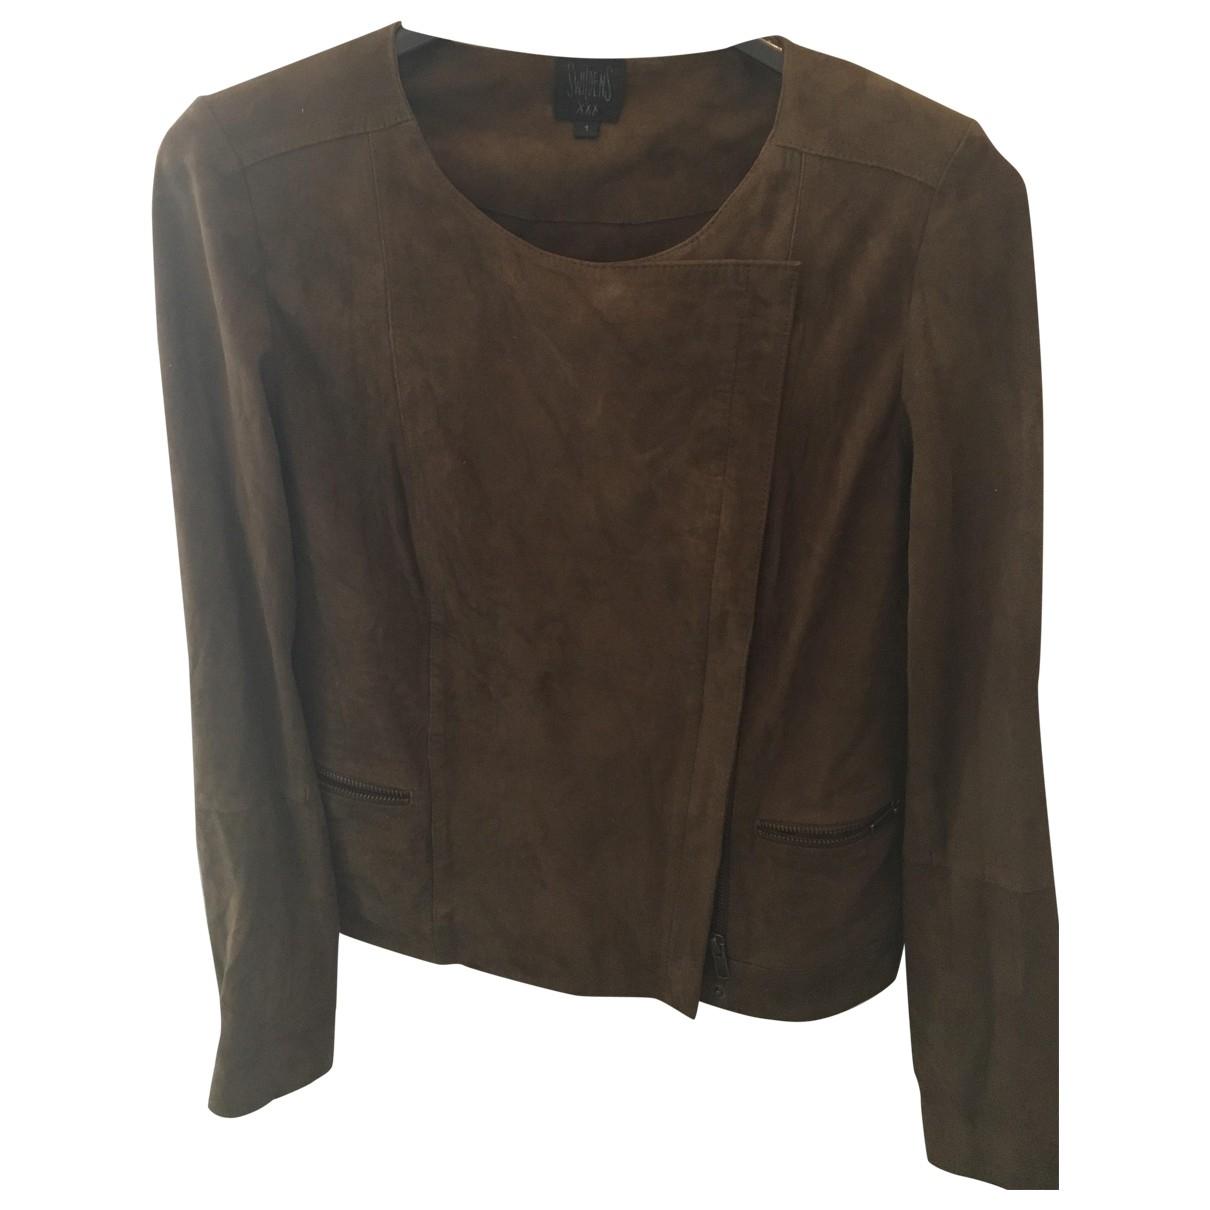 Swildens \N Brown Denim - Jeans jacket for Women 36 FR